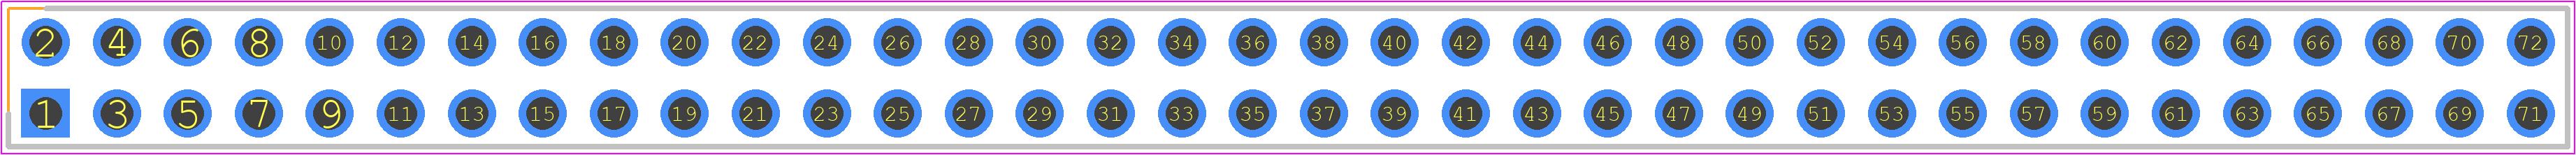 67996-272HLF - Amphenol PCB footprint - Header, Vertical - 67996-272HLF